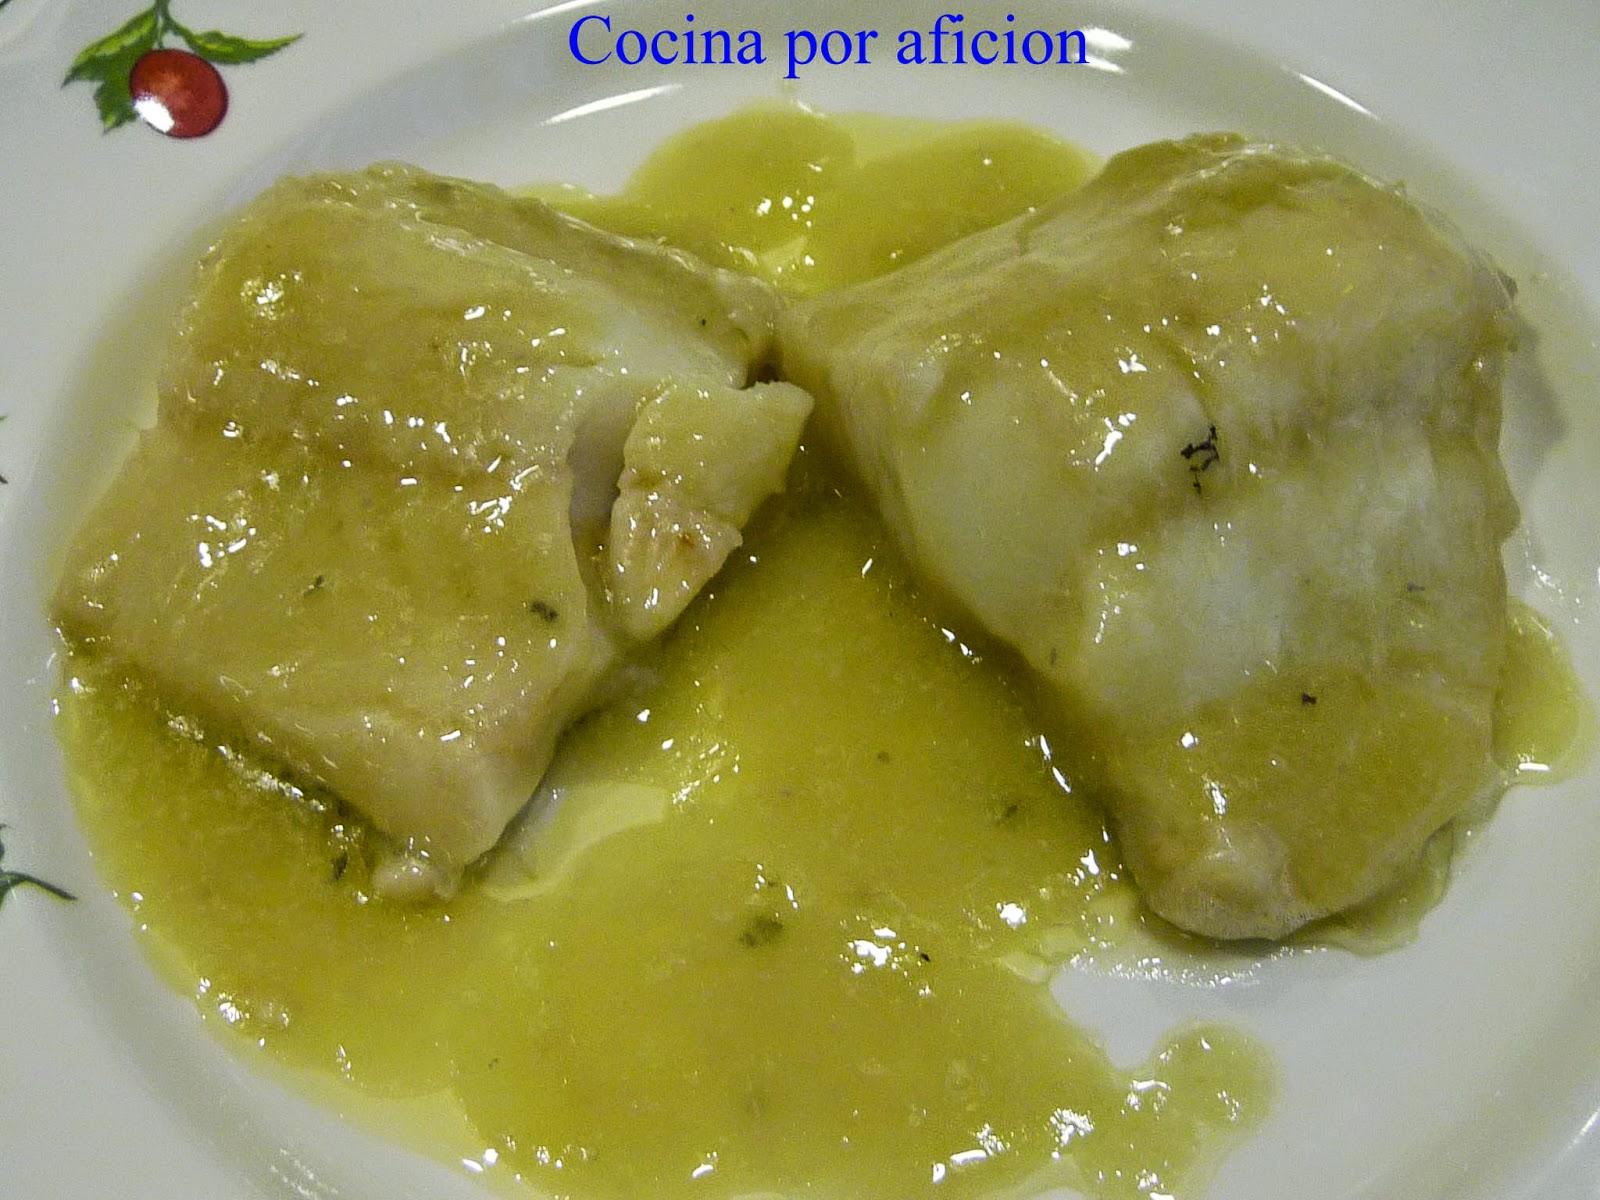 http://cocinaporaficion.blogspot.com.es/2008/09/bacalao-al-pil-pil.html